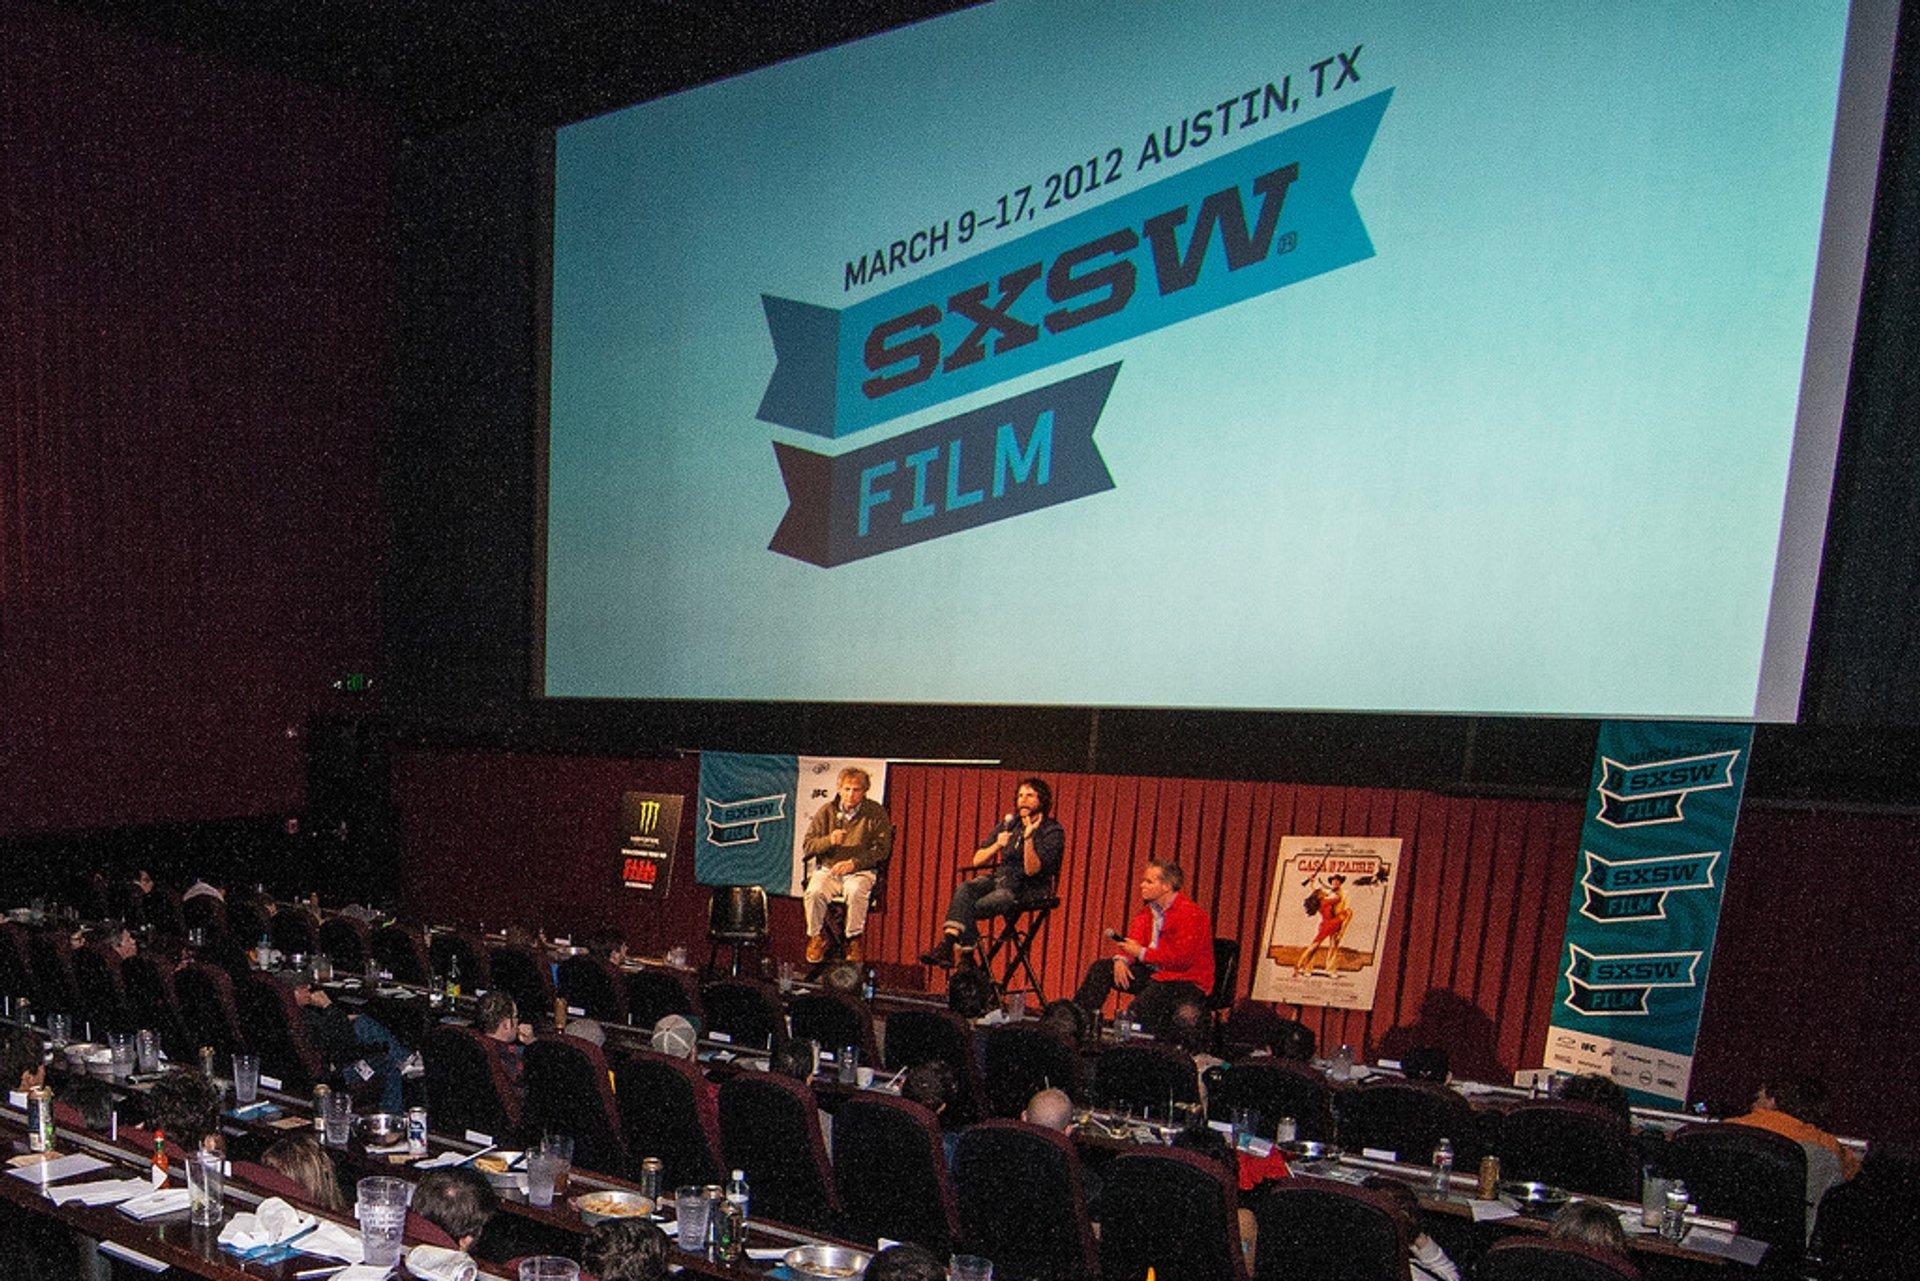 SXSW Film Festival in Texas - Best Time